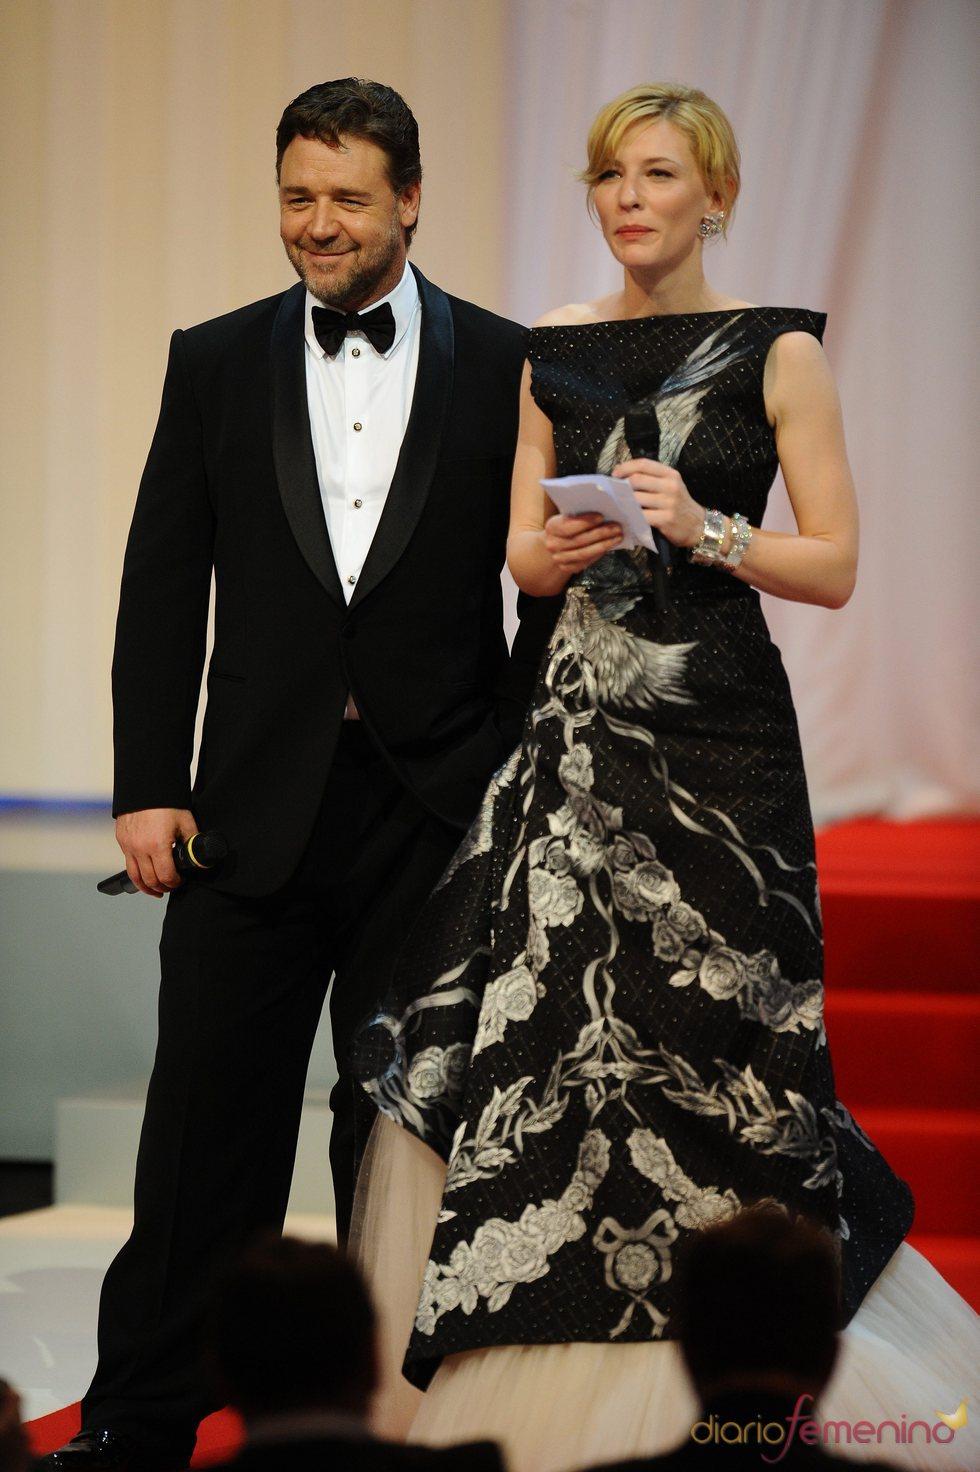 Russell Crowe y Cate Blanchett presentan 'Robin Hood' en Cannes